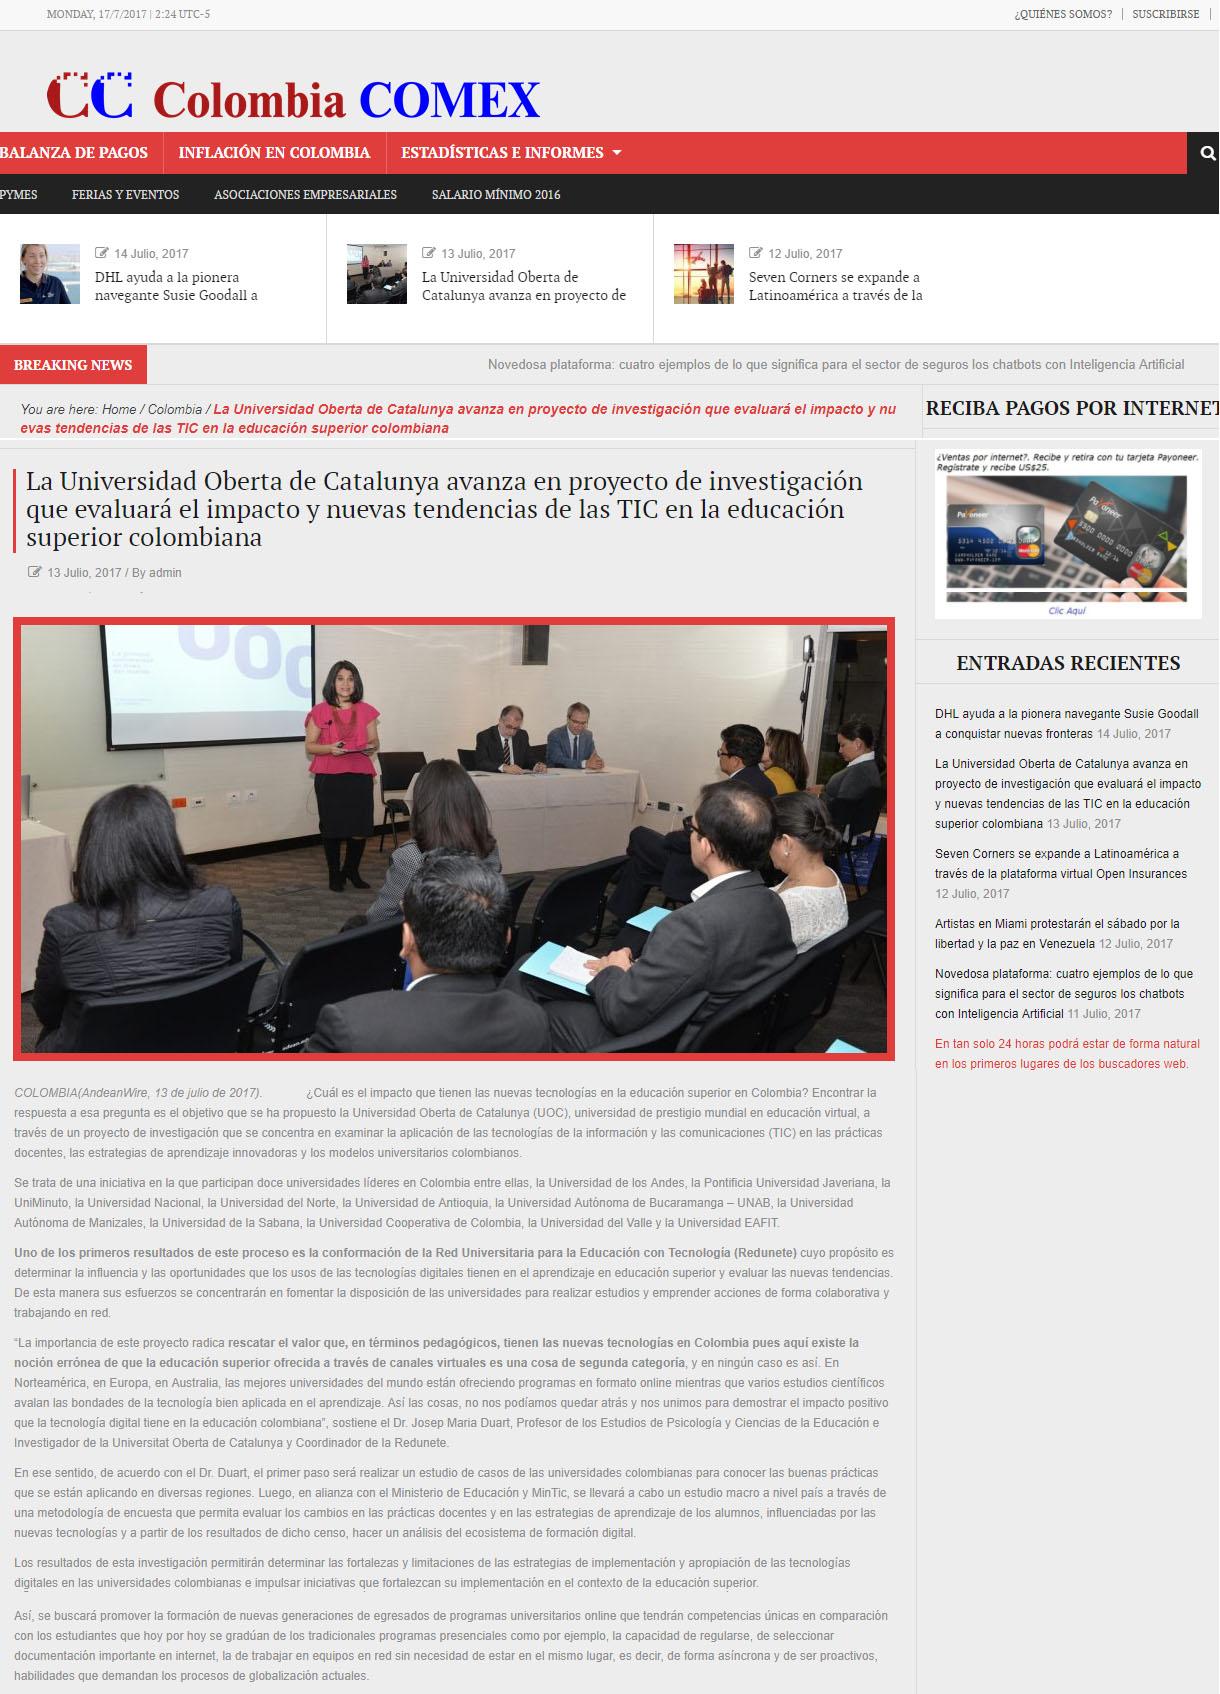 www.colombiacomex.com.co 13 de Julio 2017